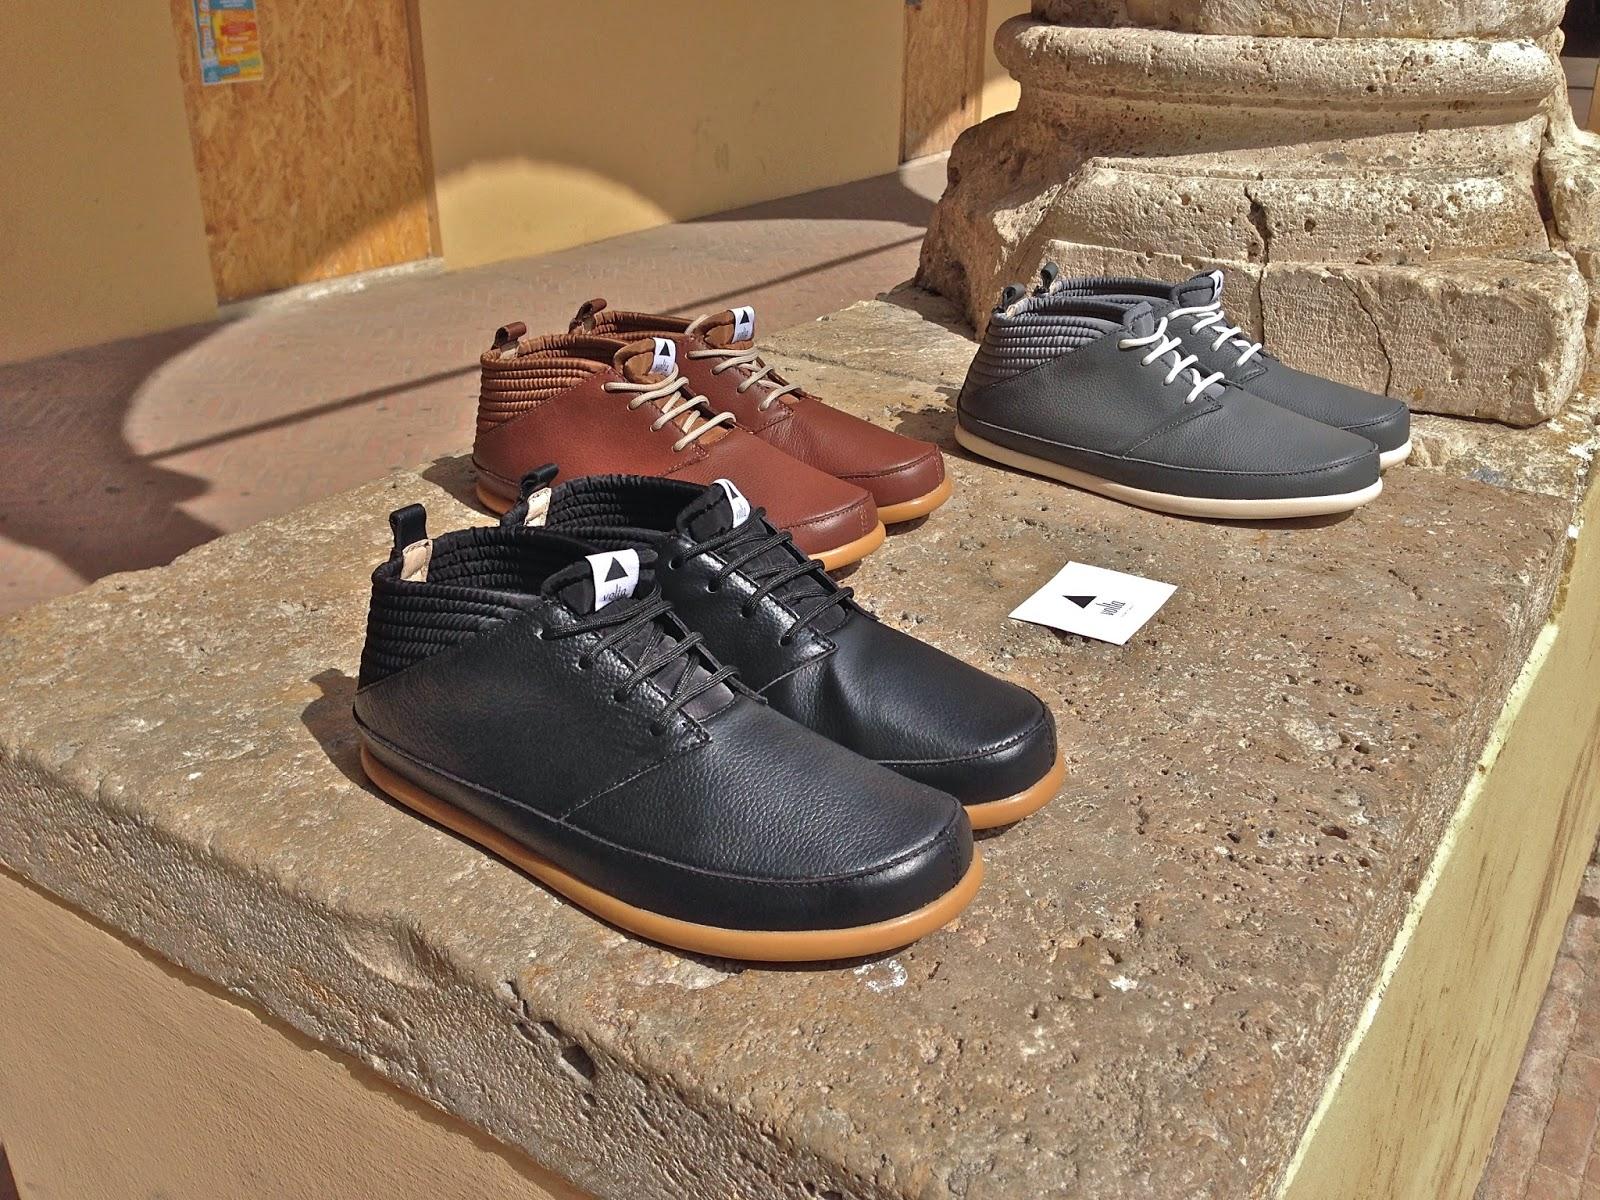 Footwear Epta Volta Instant Epta Classic HFWR7